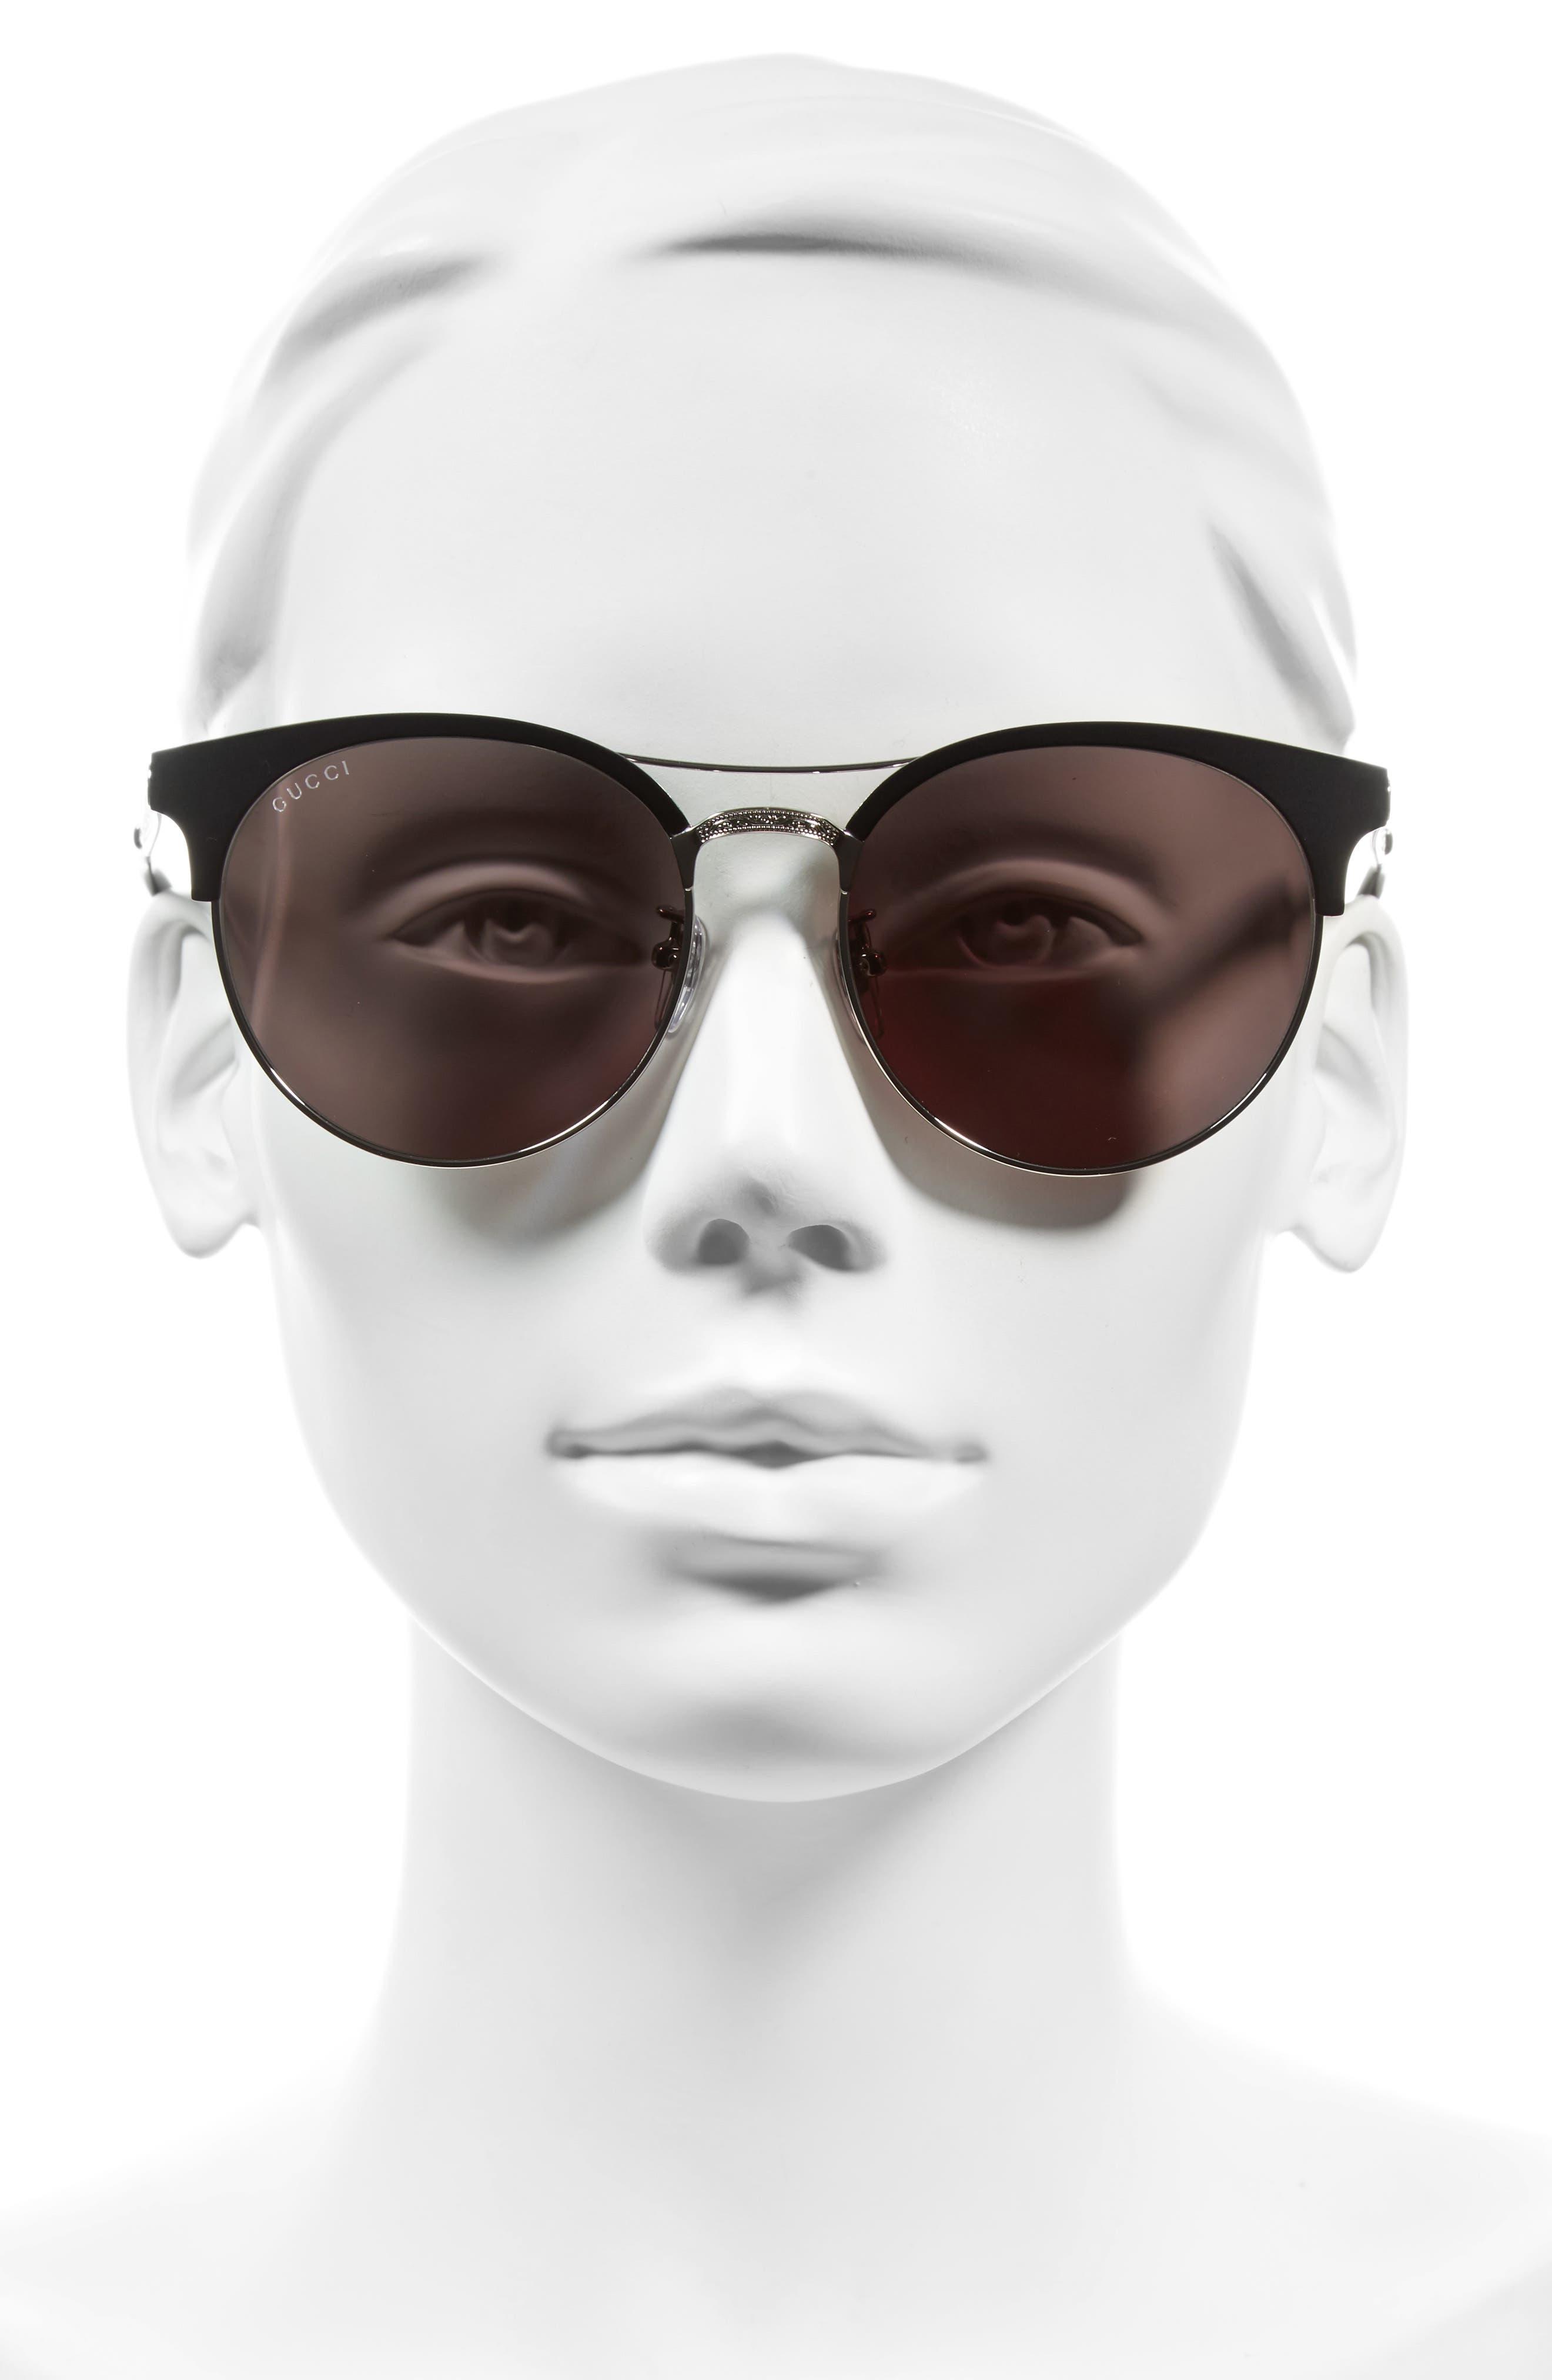 56mm Retro Sunglasses,                             Alternate thumbnail 4, color,